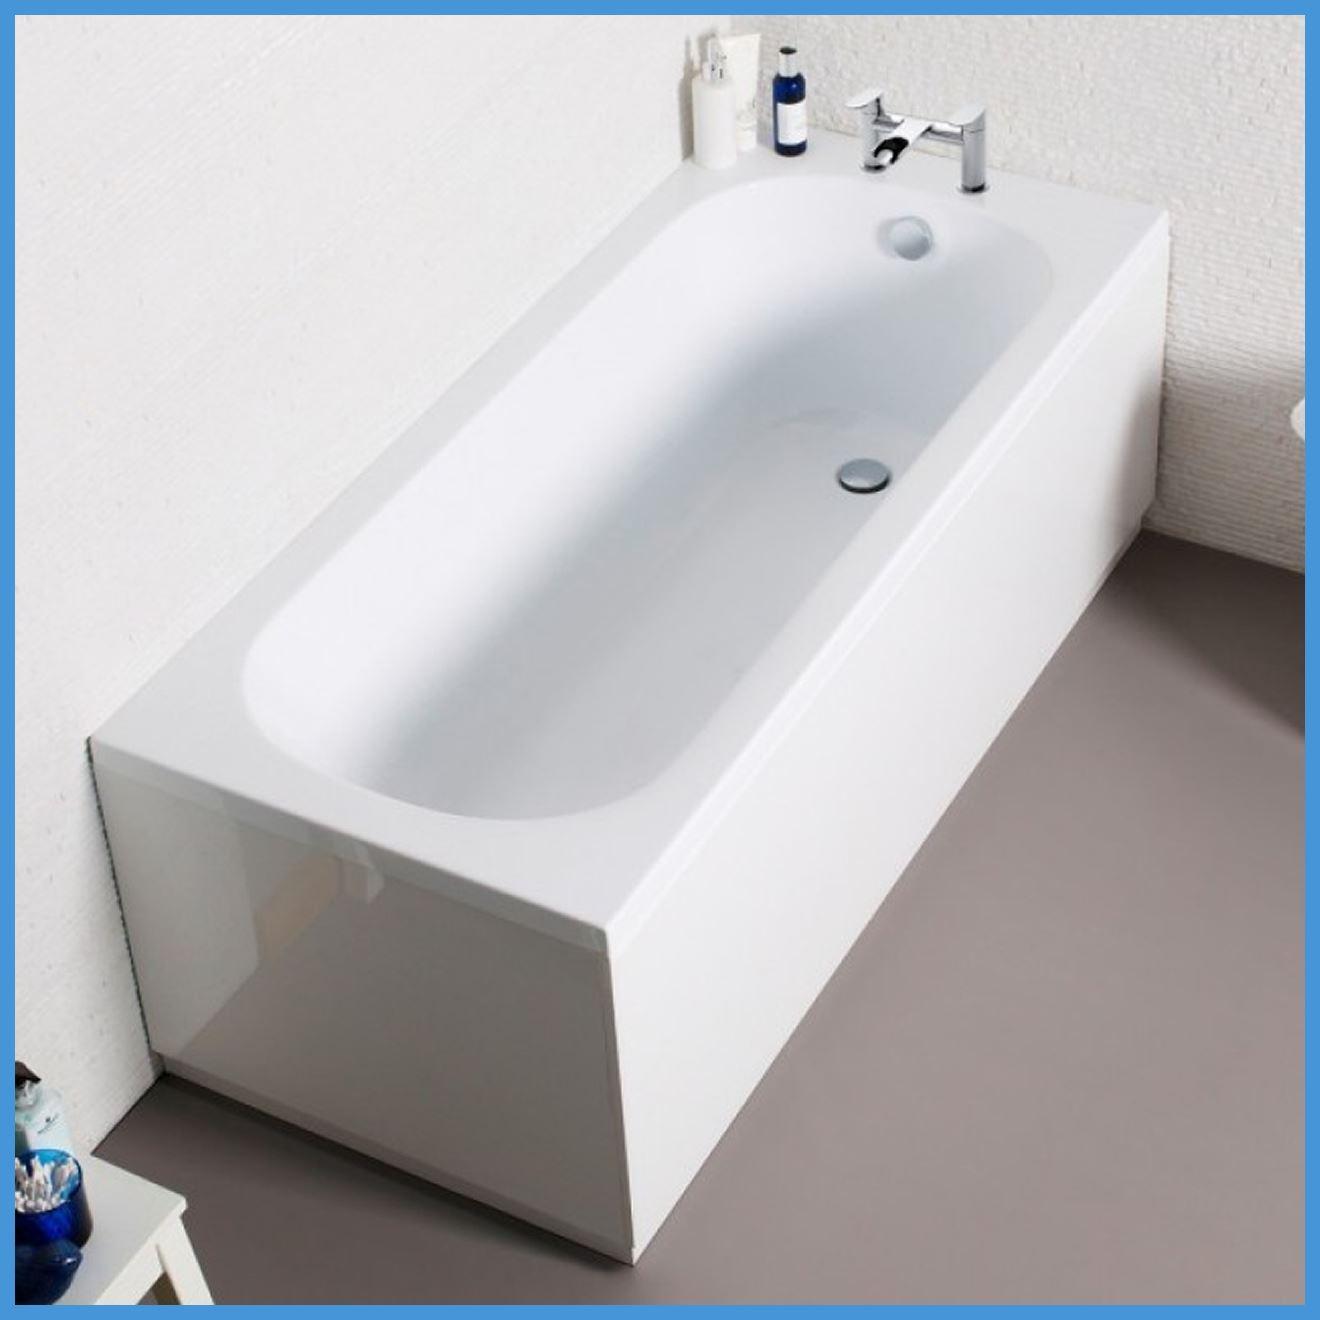 Straight White Bath Modern Bathroom Acrylic End Panel Front Panel ...